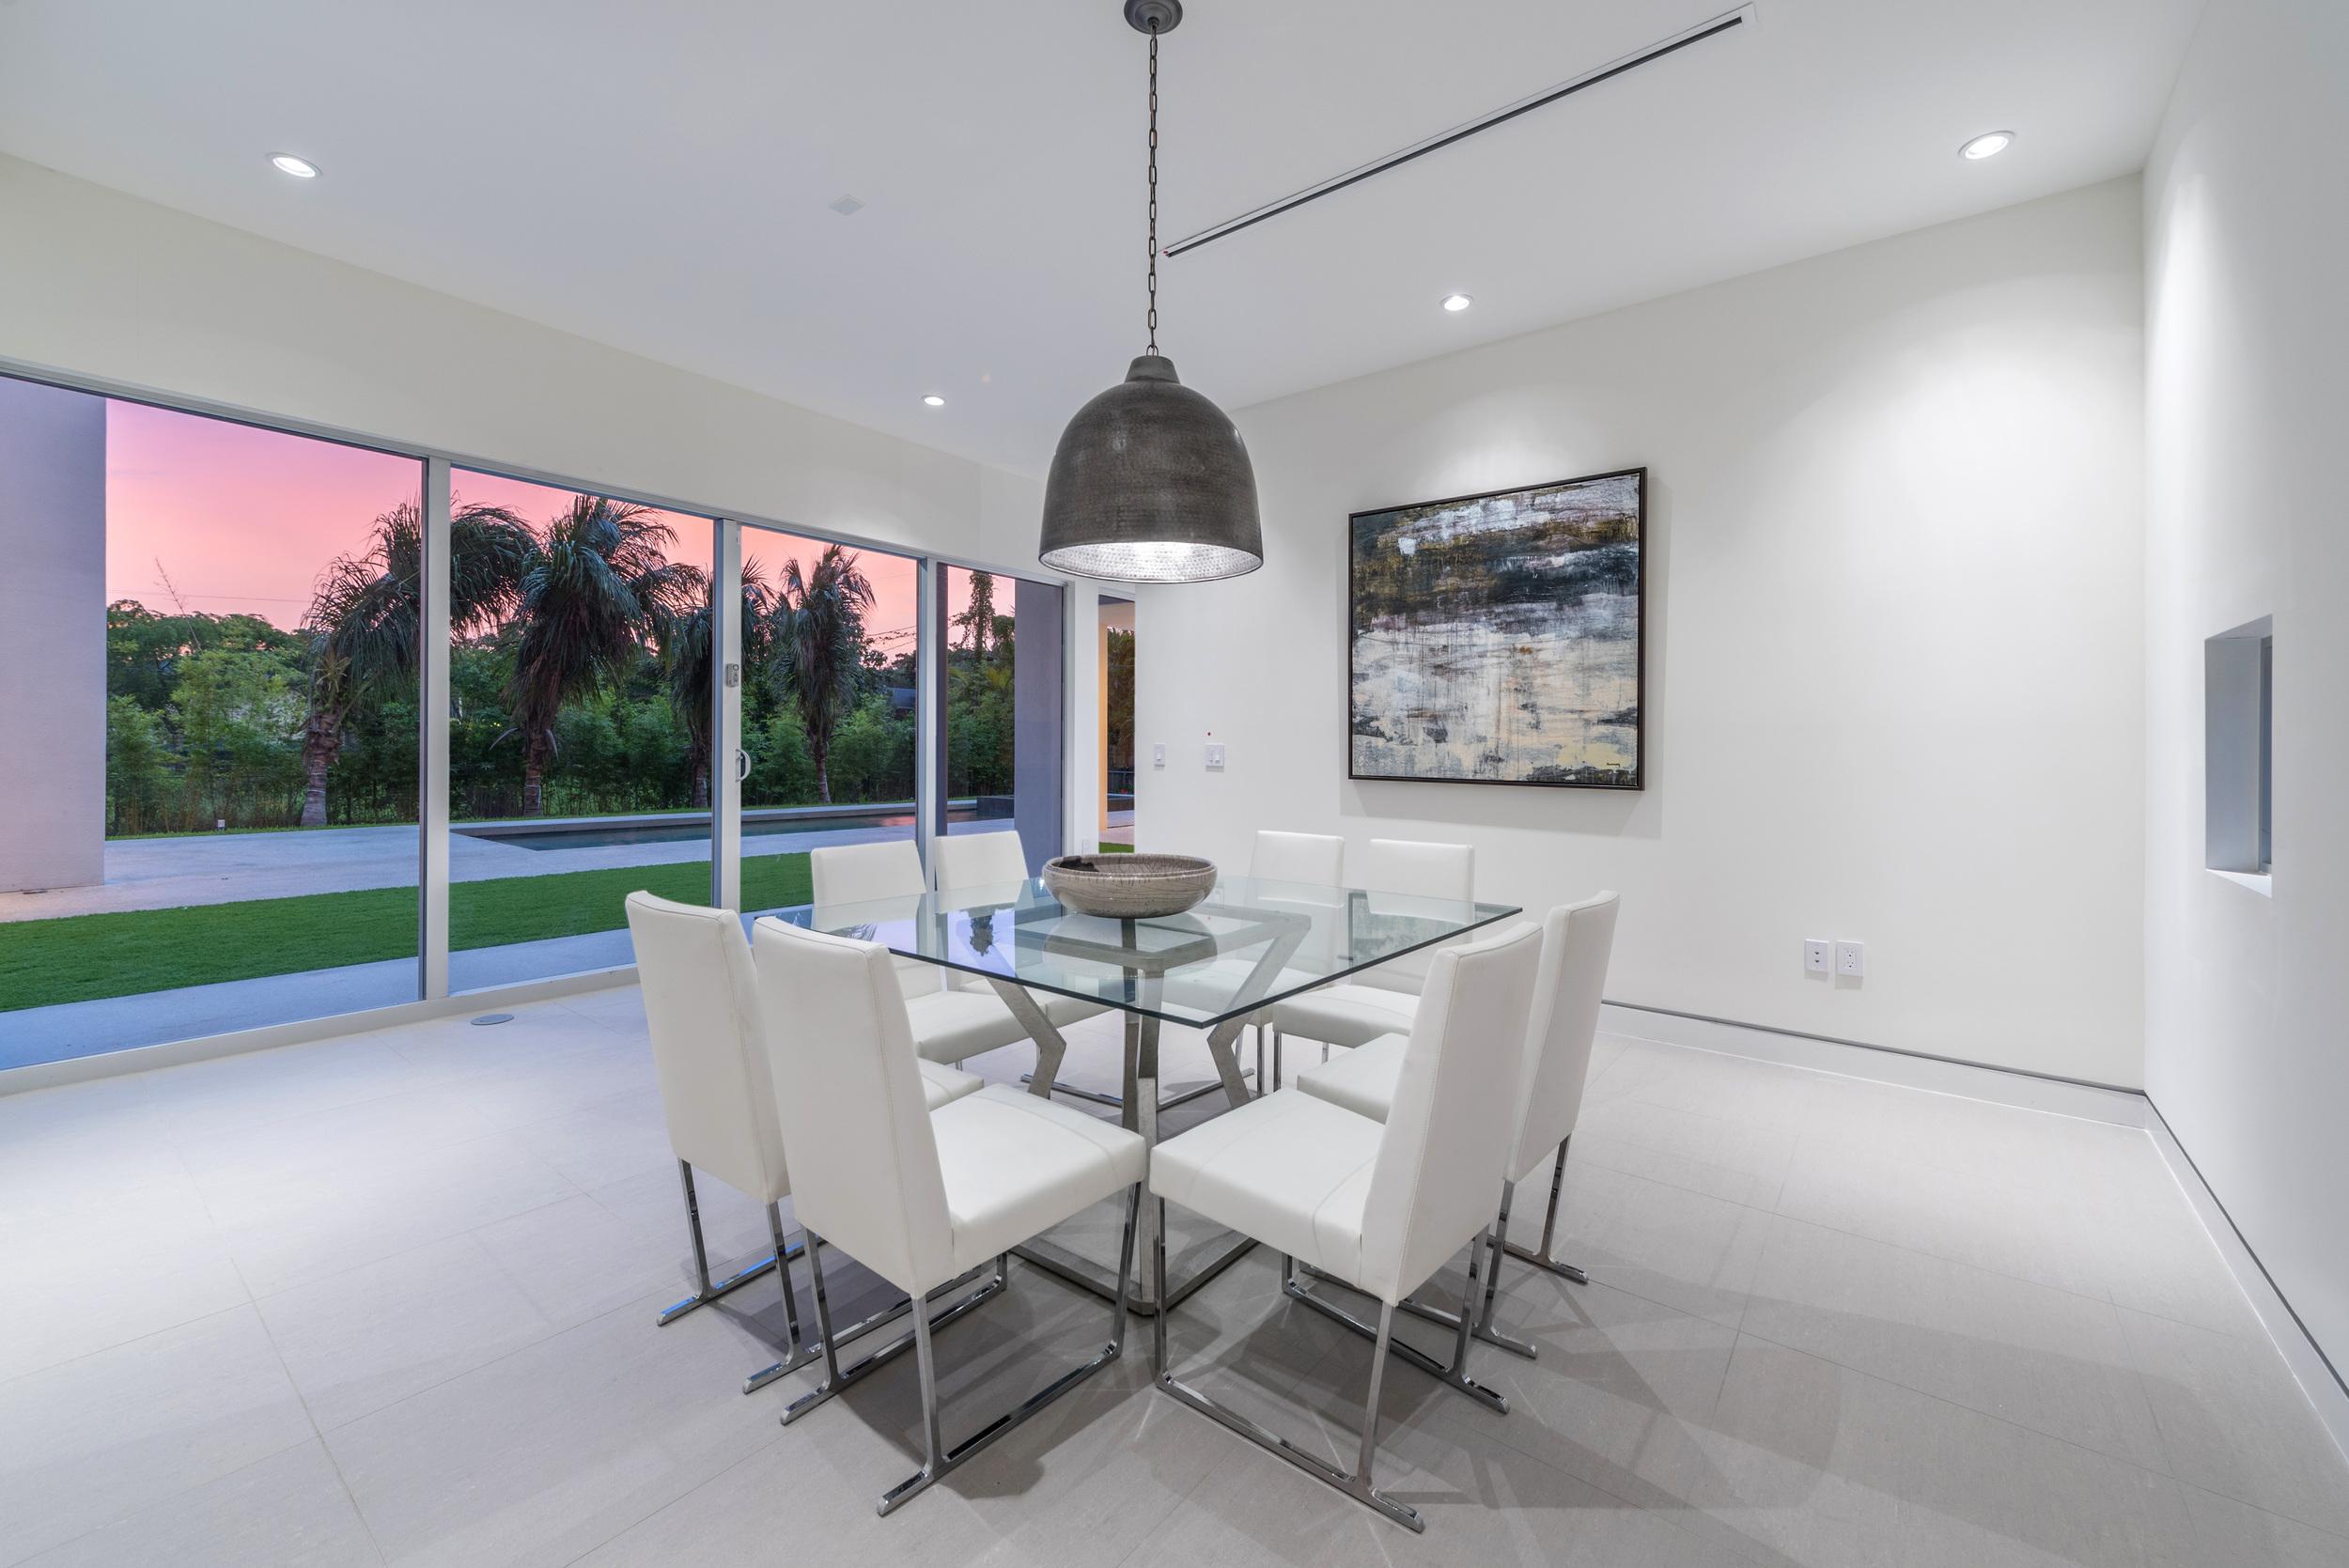 The Setting Homes Plum House Miami Florida Interior Dining Room Dusk TARIS Real Estate